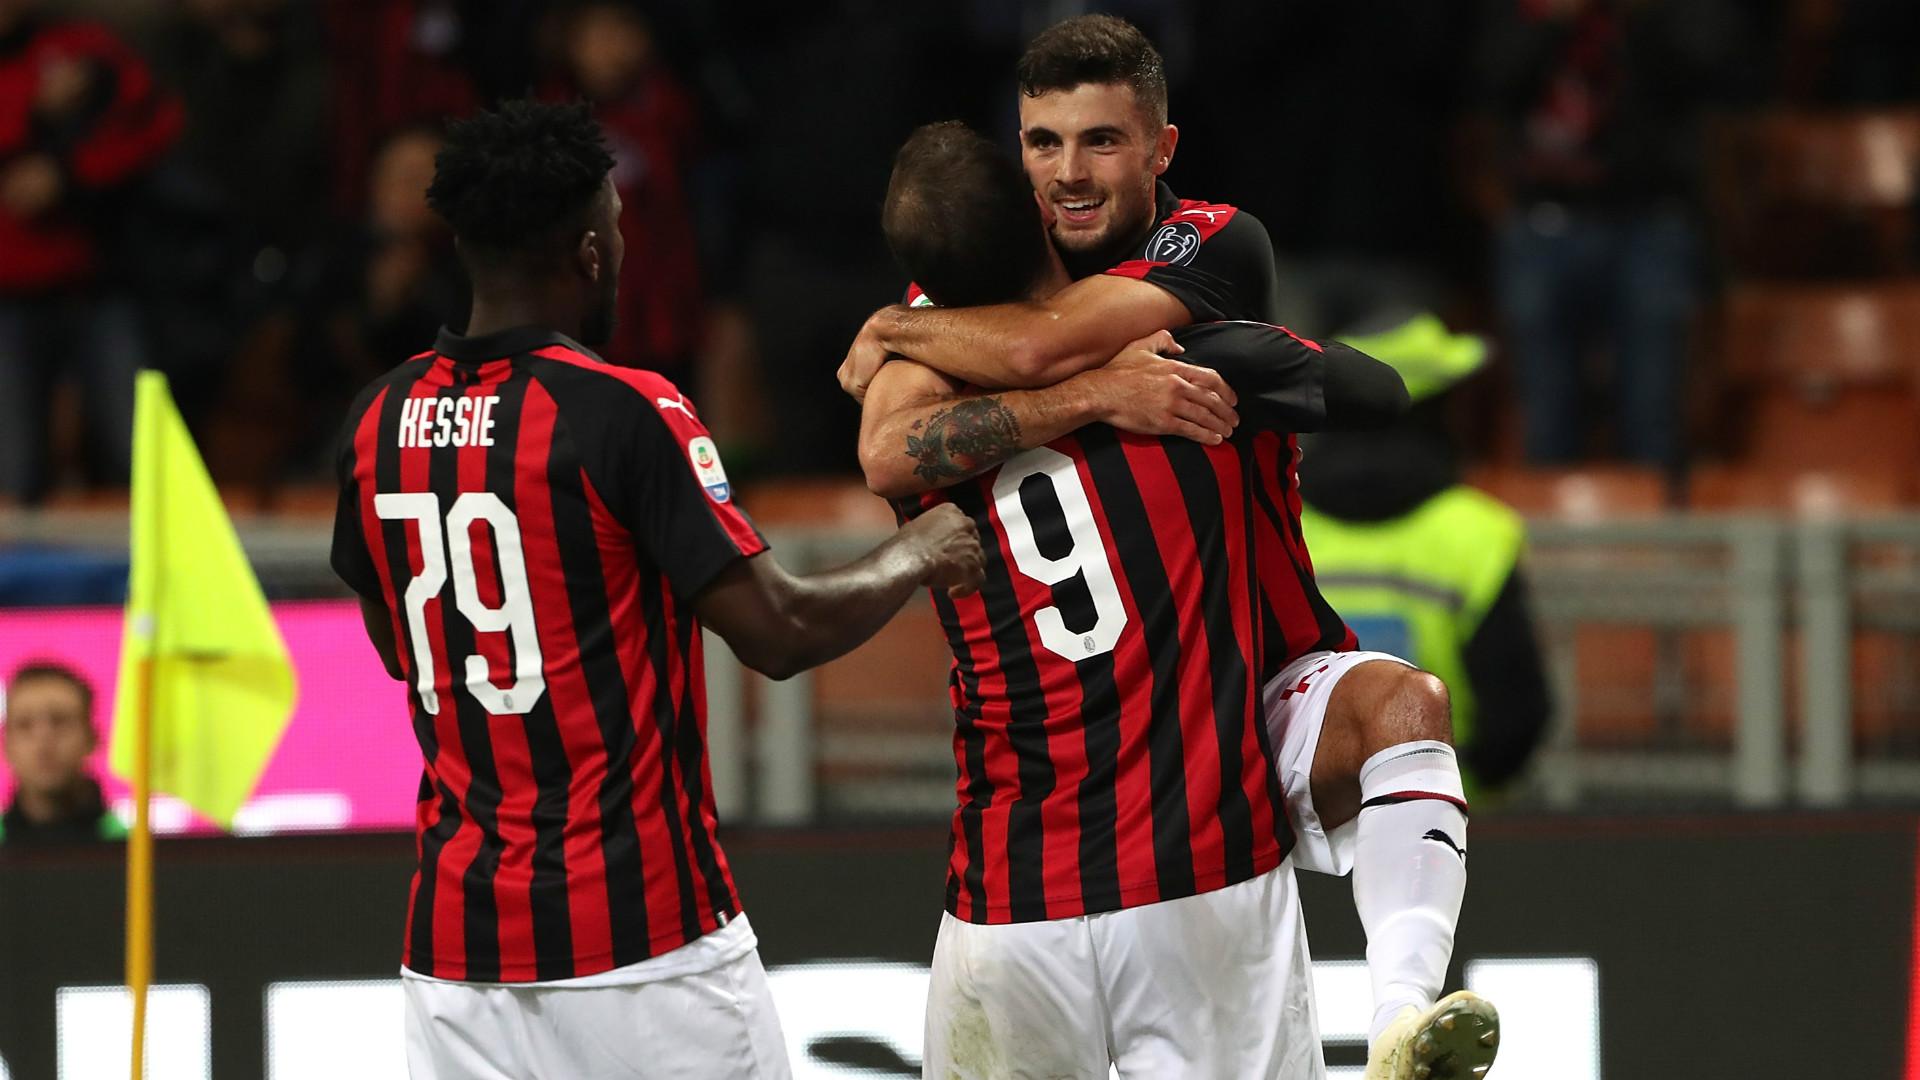 Milan celeb Sampdoria